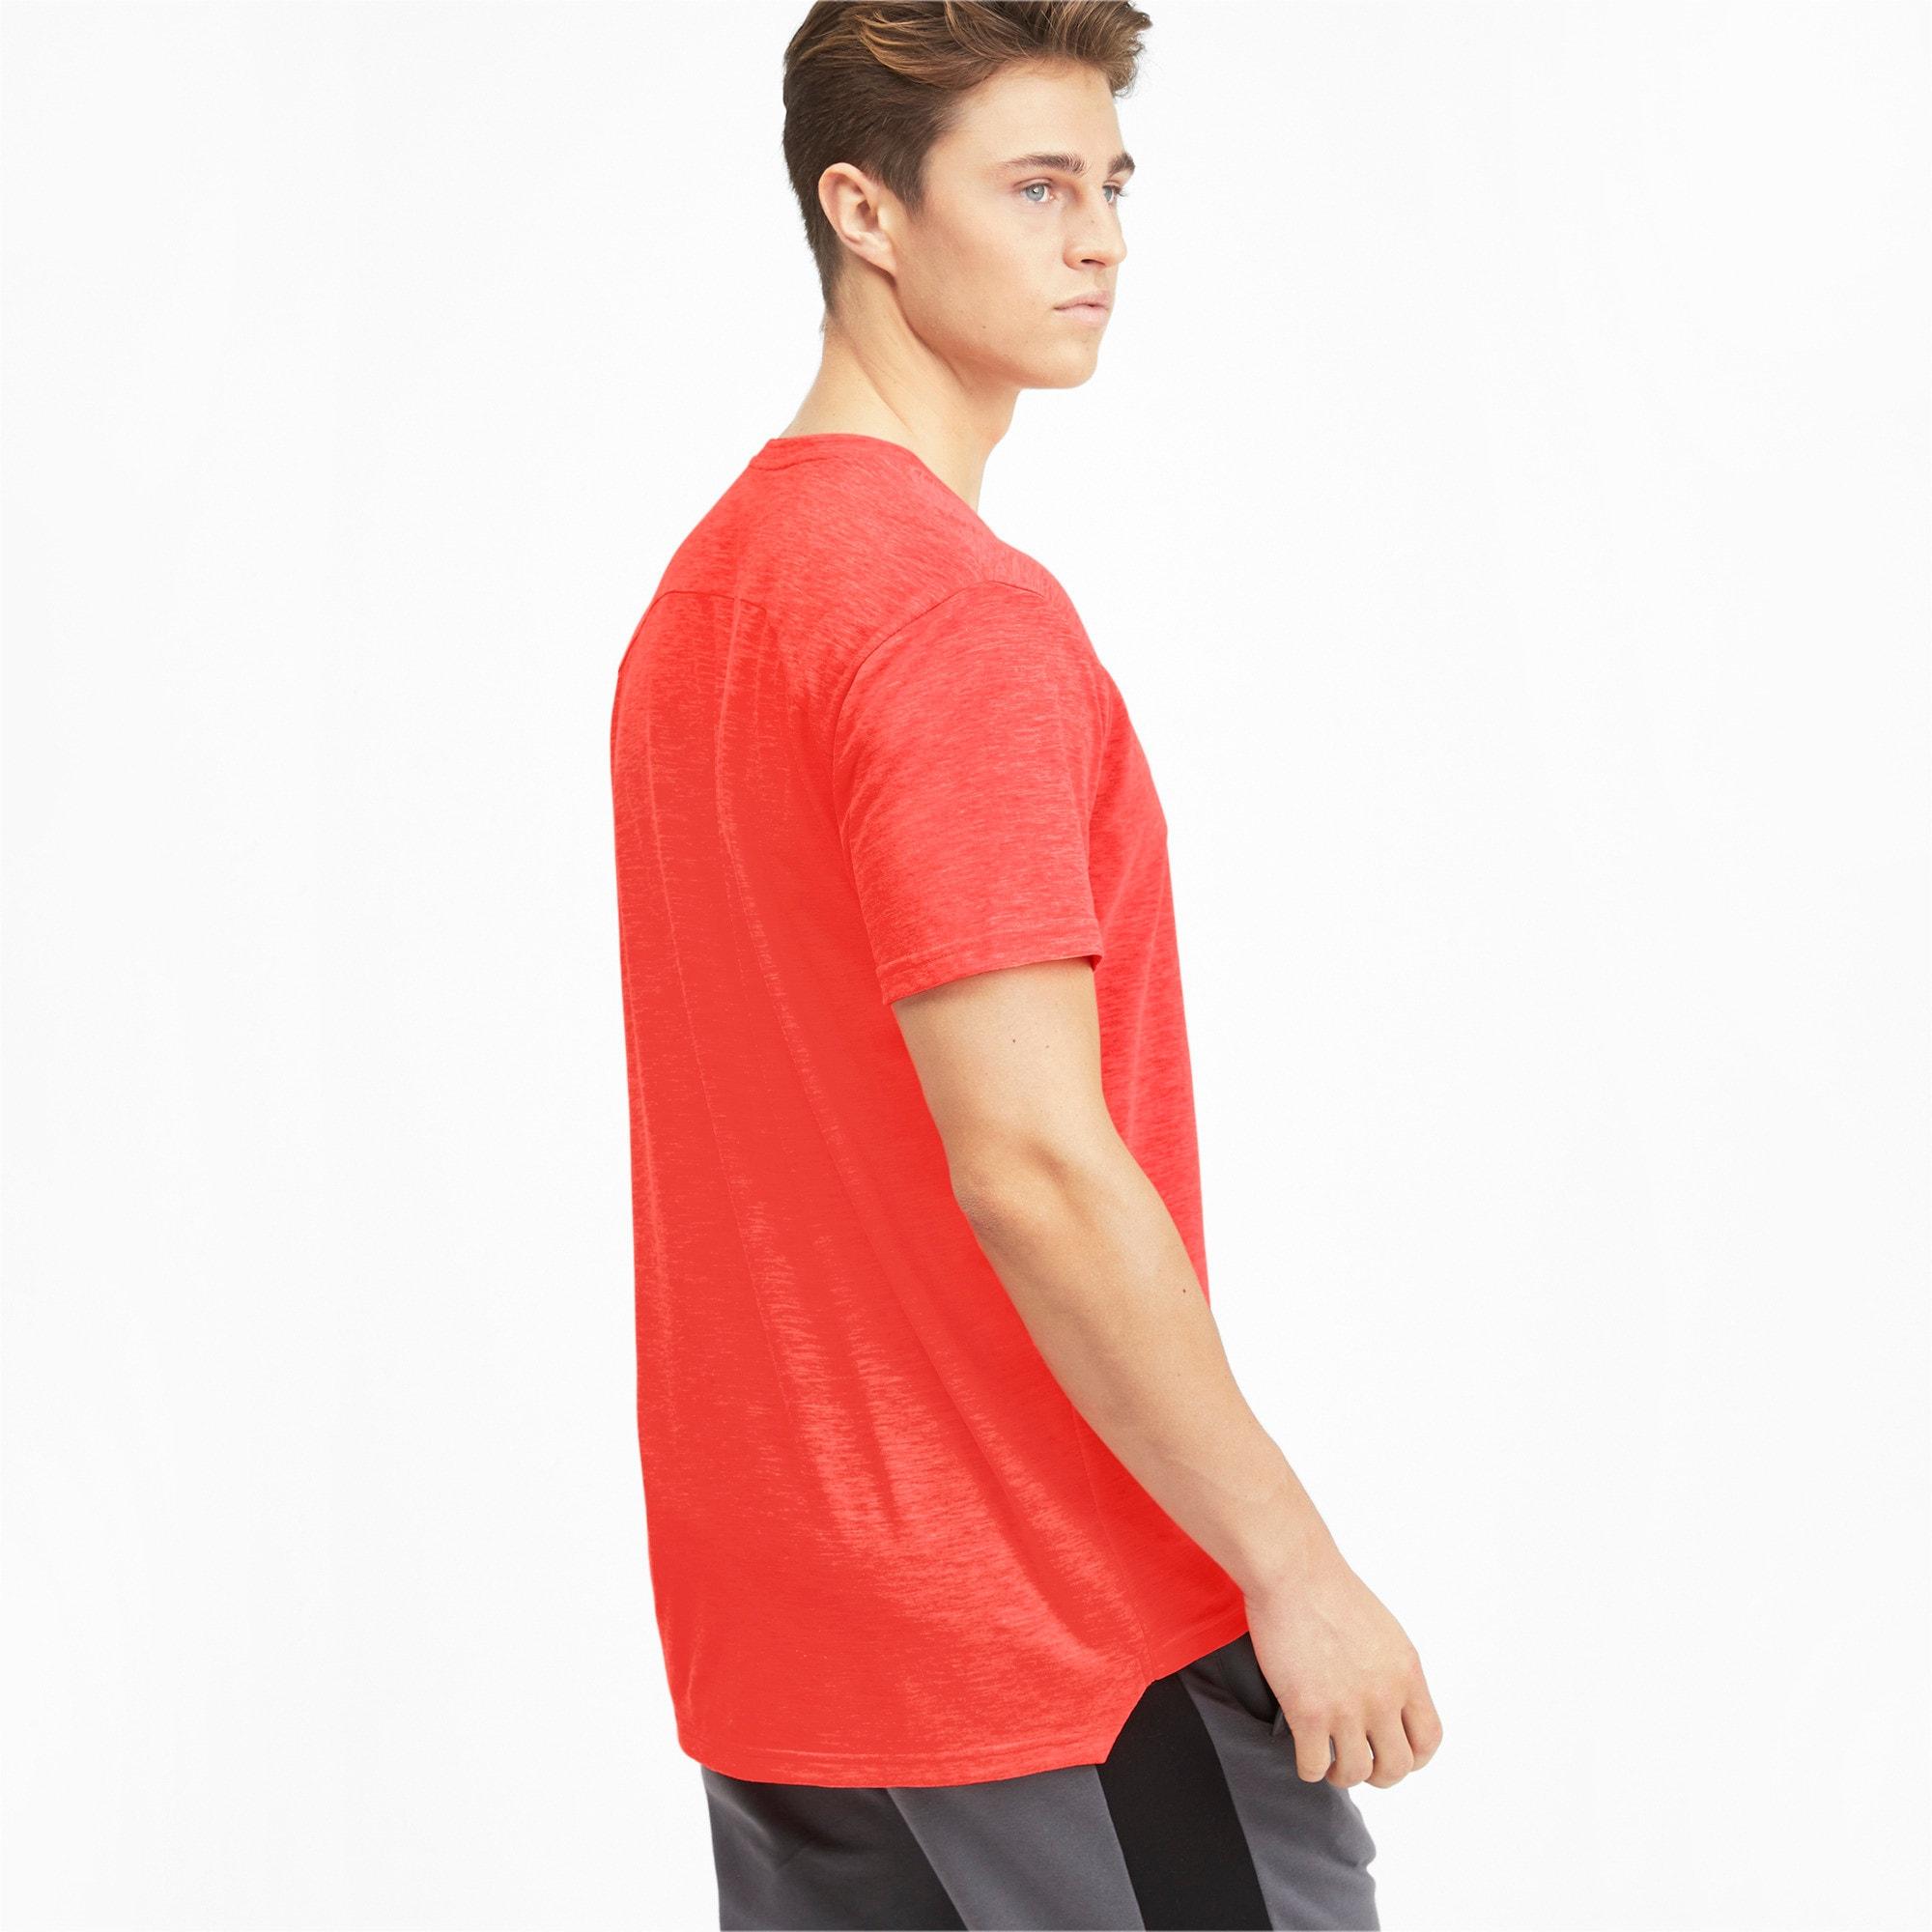 Thumbnail 2 of Energy Herren Training T-Shirt, Nrgy Red Heather, medium